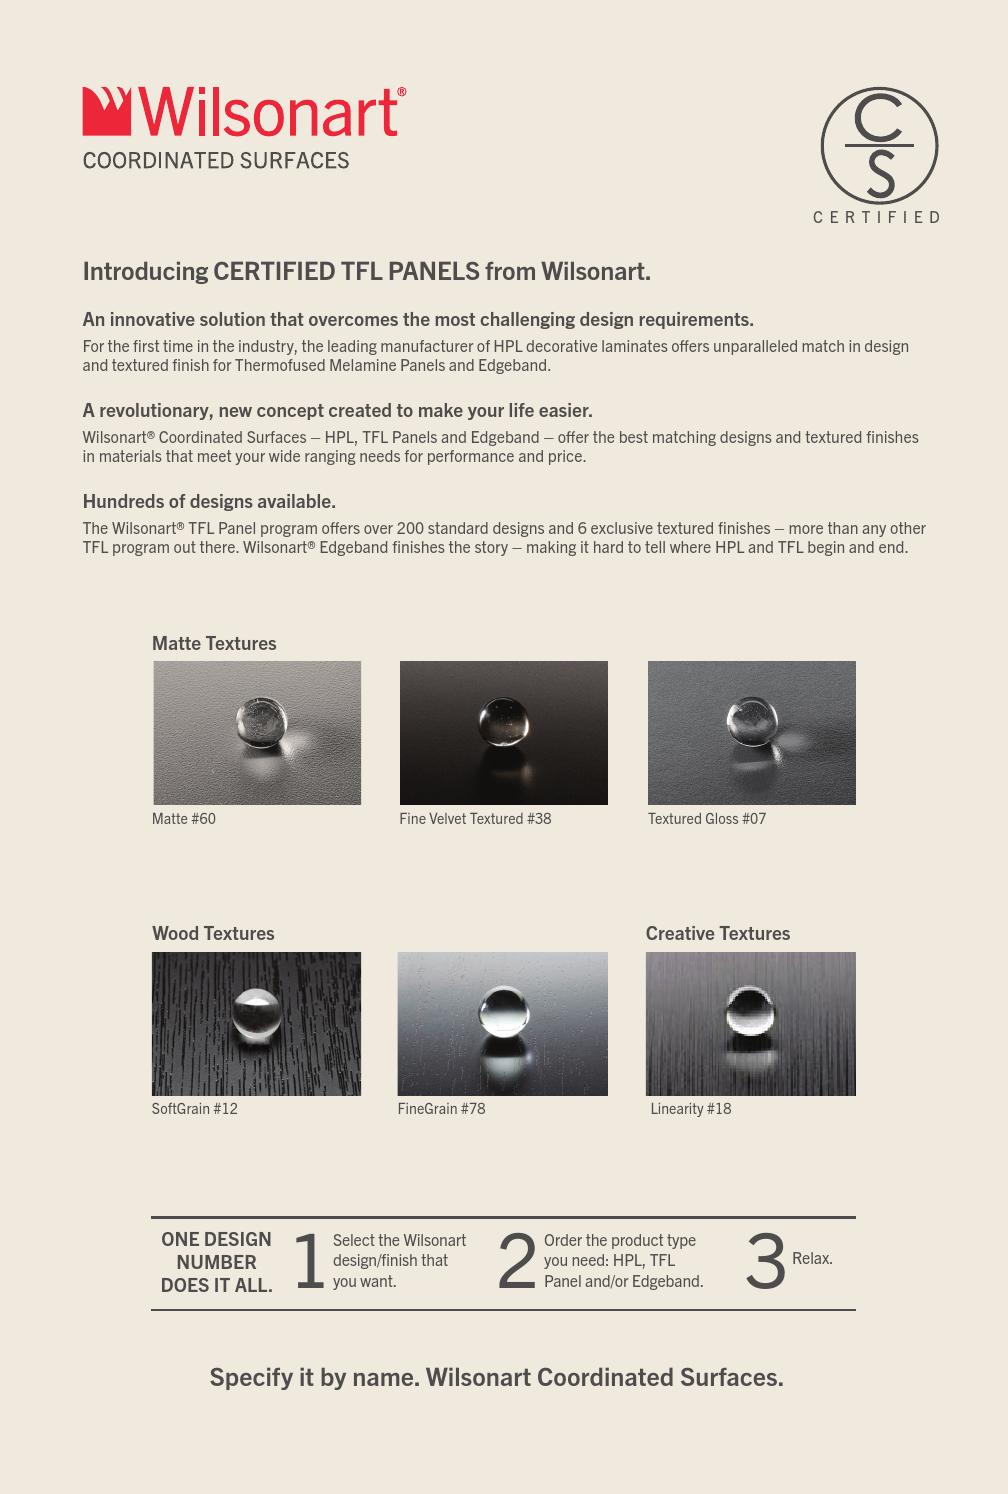 Wilsonart® Coordinated Surfaces Certified Panels Brochure by